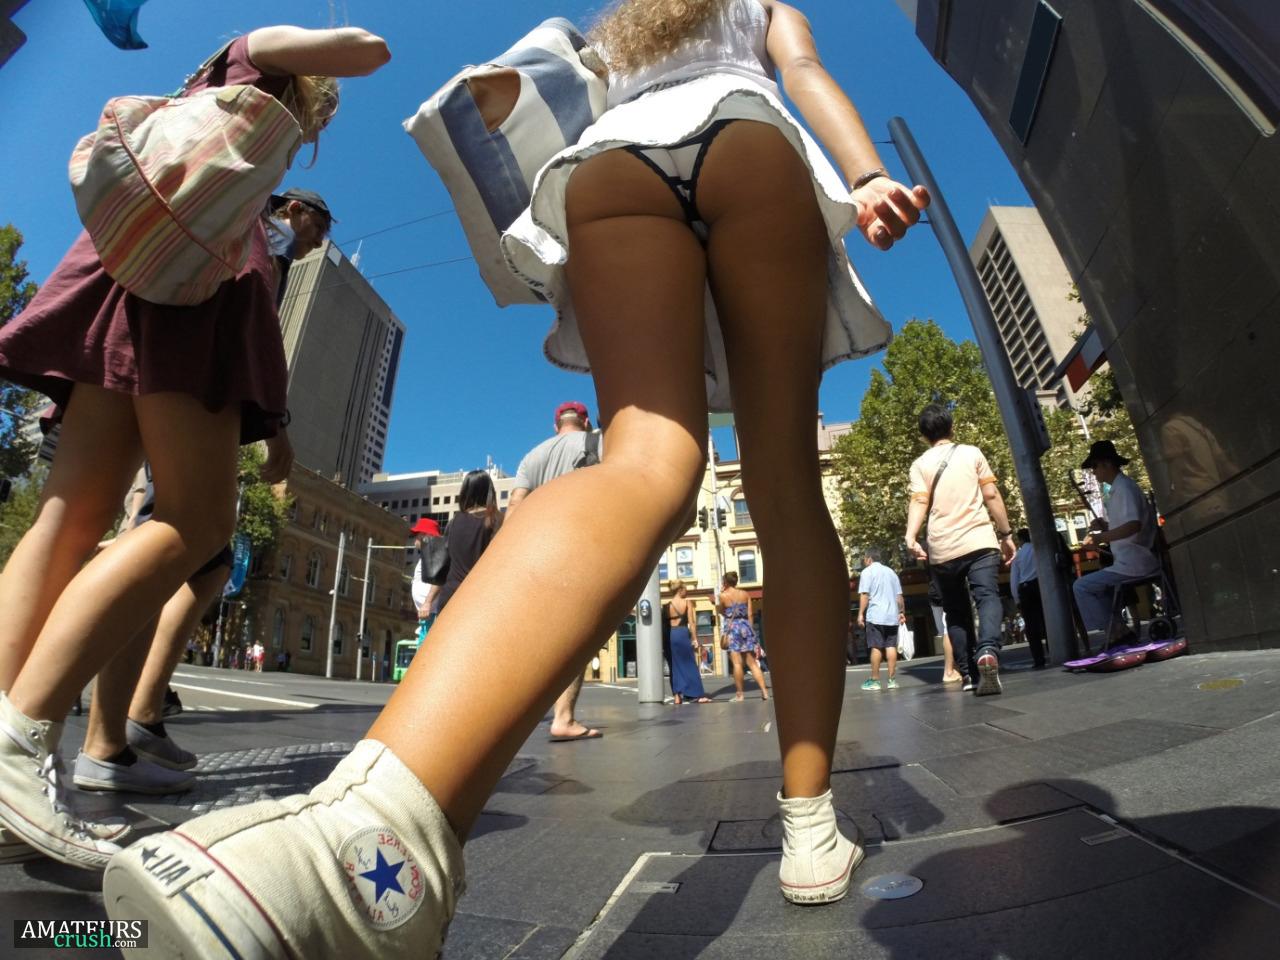 Slem girls nude fuck photos